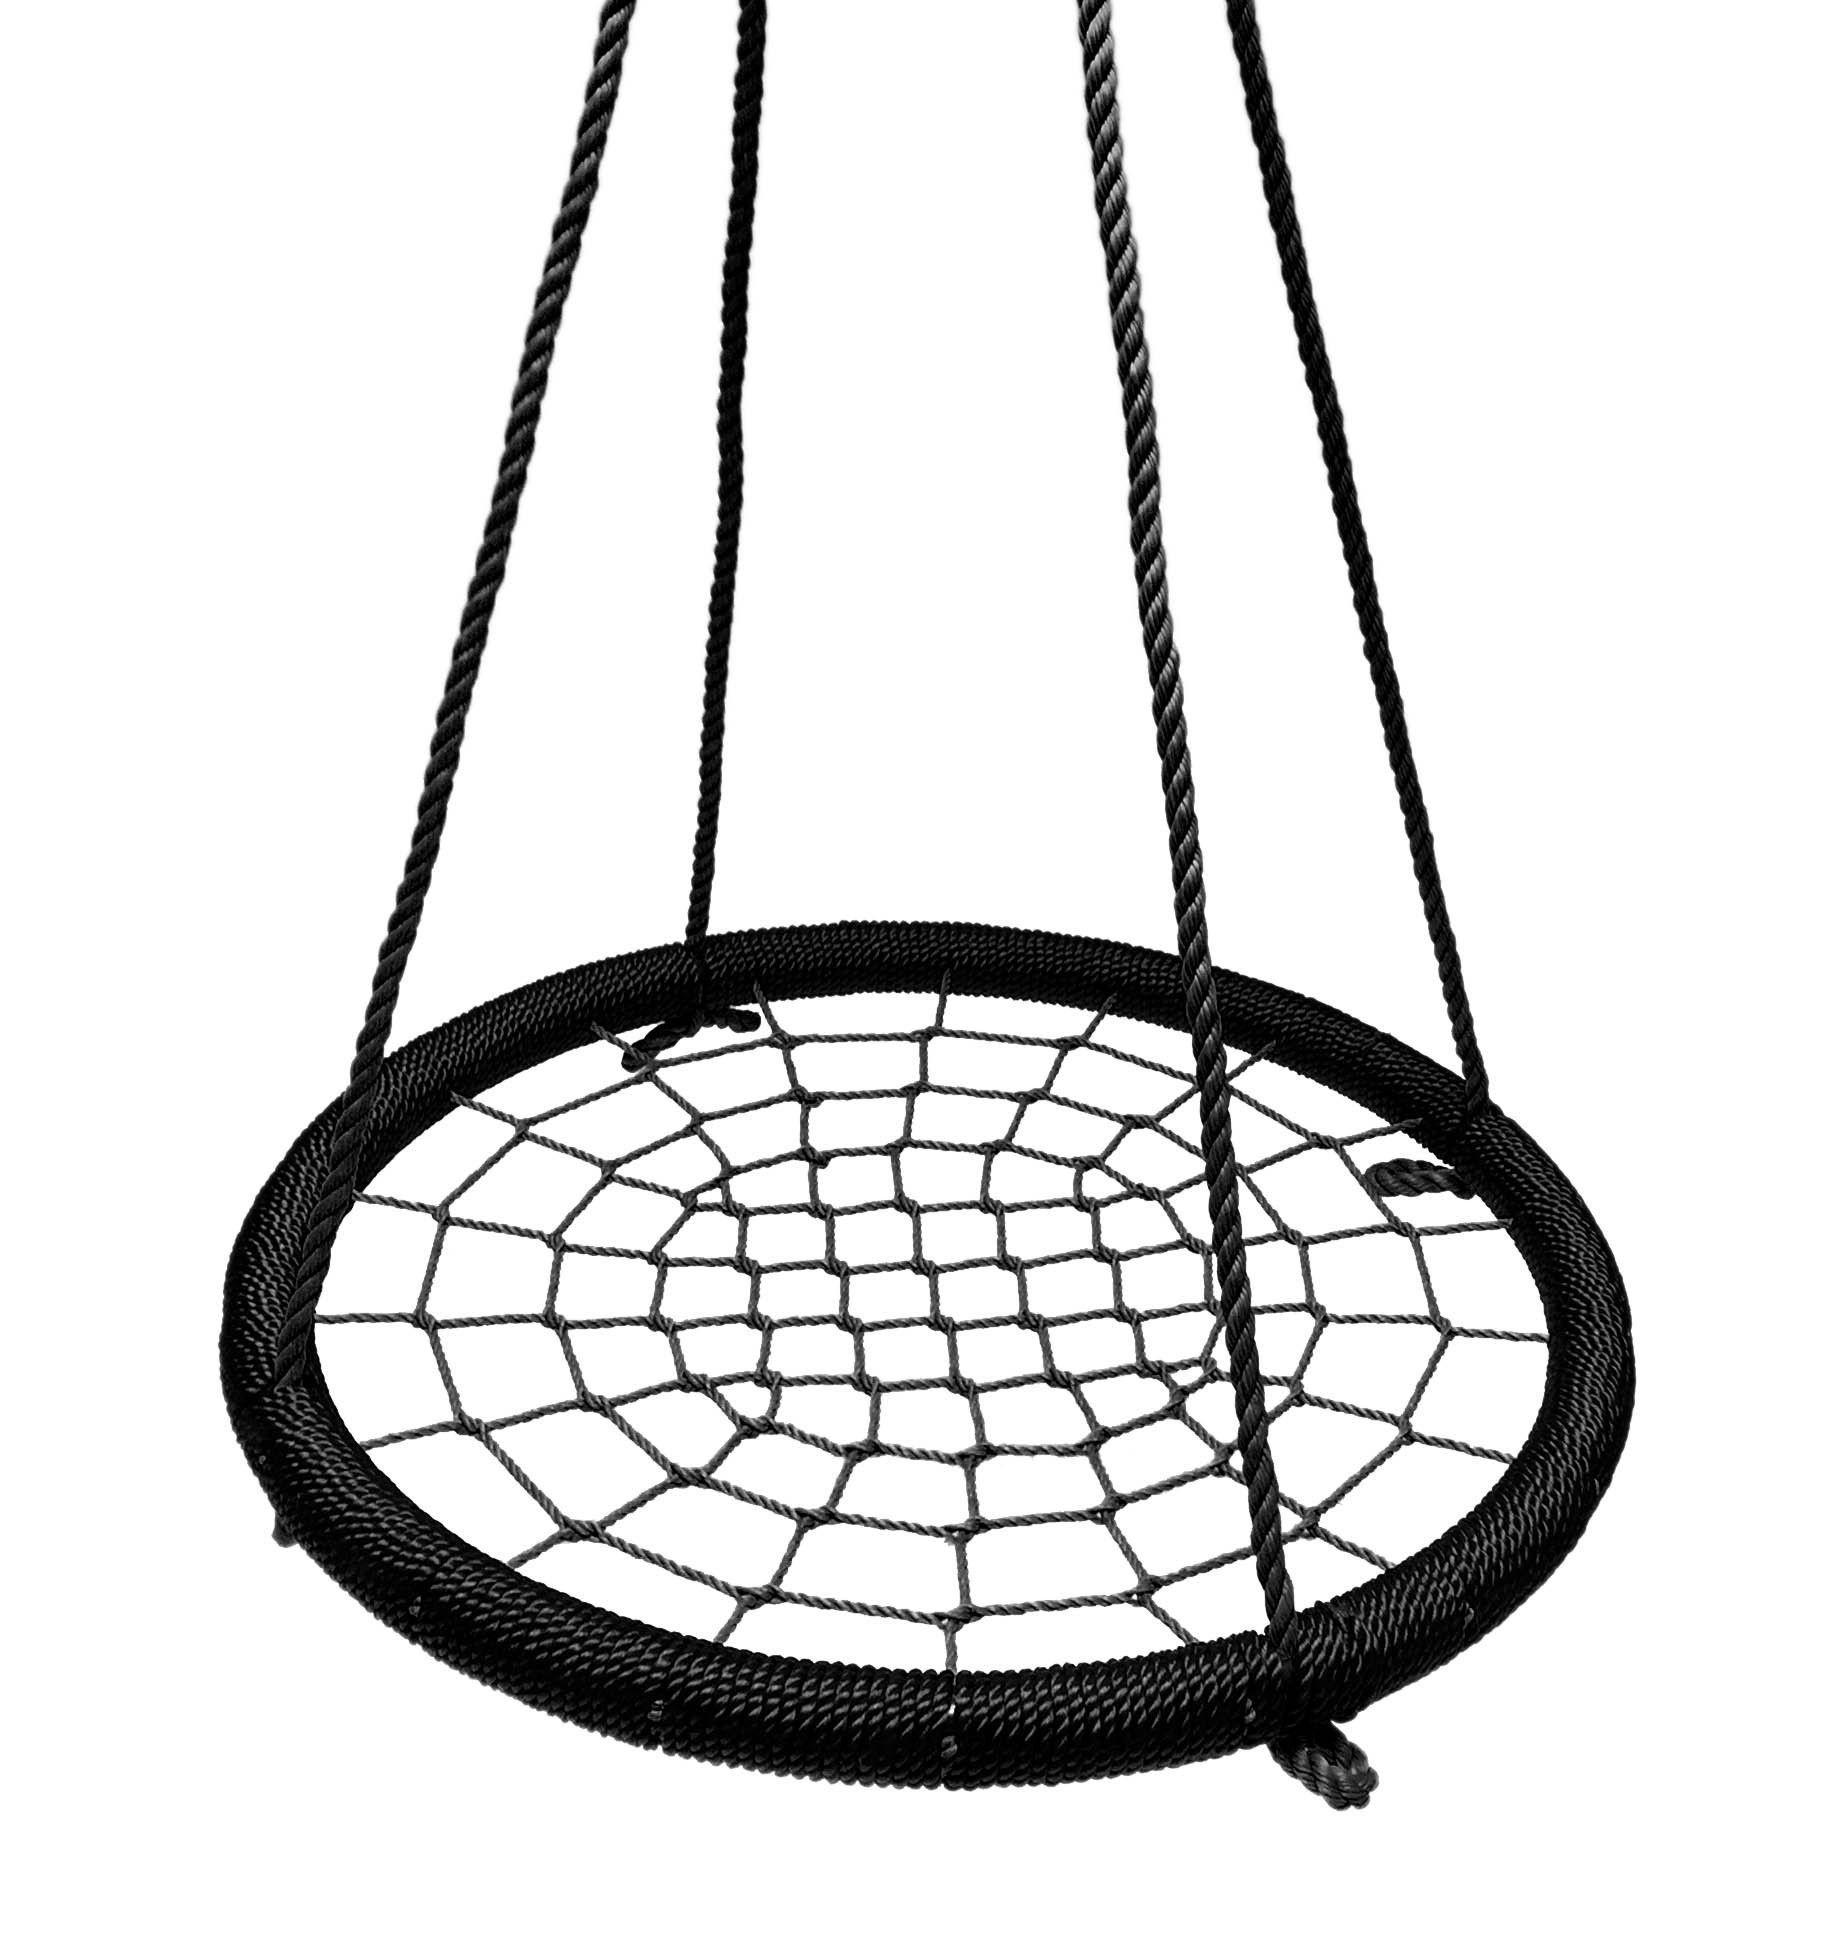 "SkyBound Giant Round 40"" Tree Swing Net - Black (NS-100-BLKBLK)"